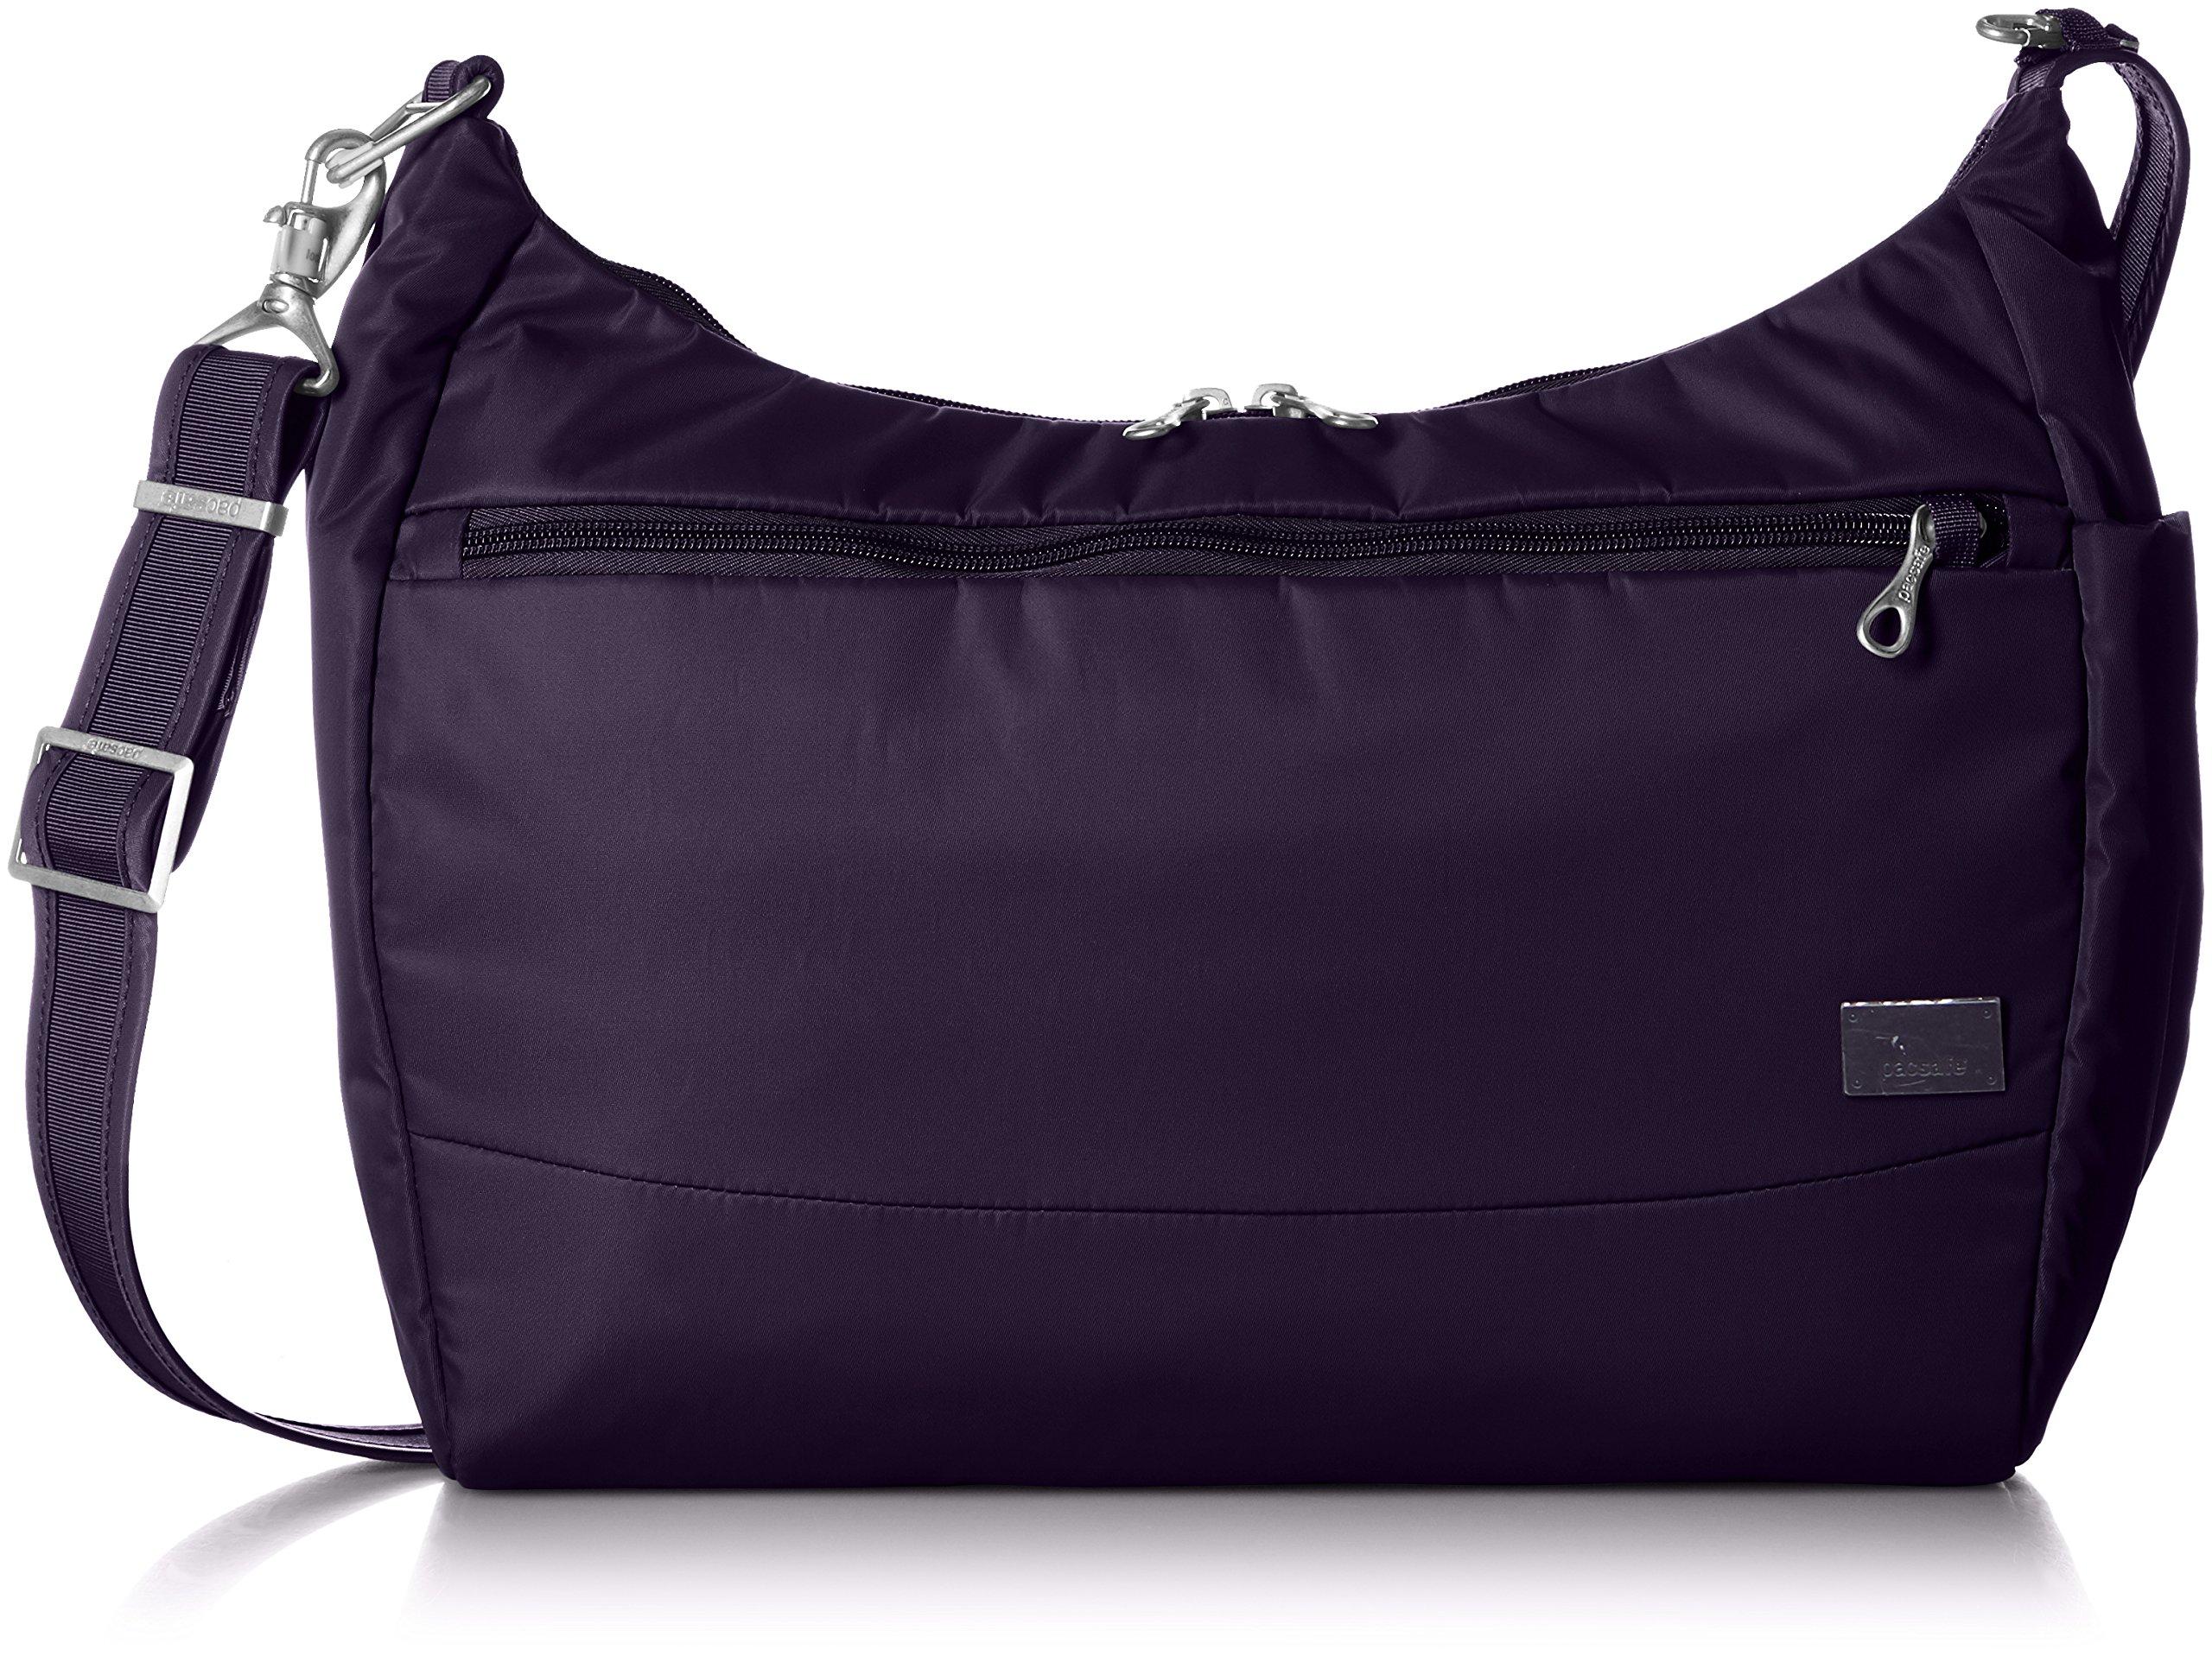 PacSafe Women's Citysafe Cs200 Anti-Theft Handbag Travel Cross-Body Bag, Mulberry, One Size